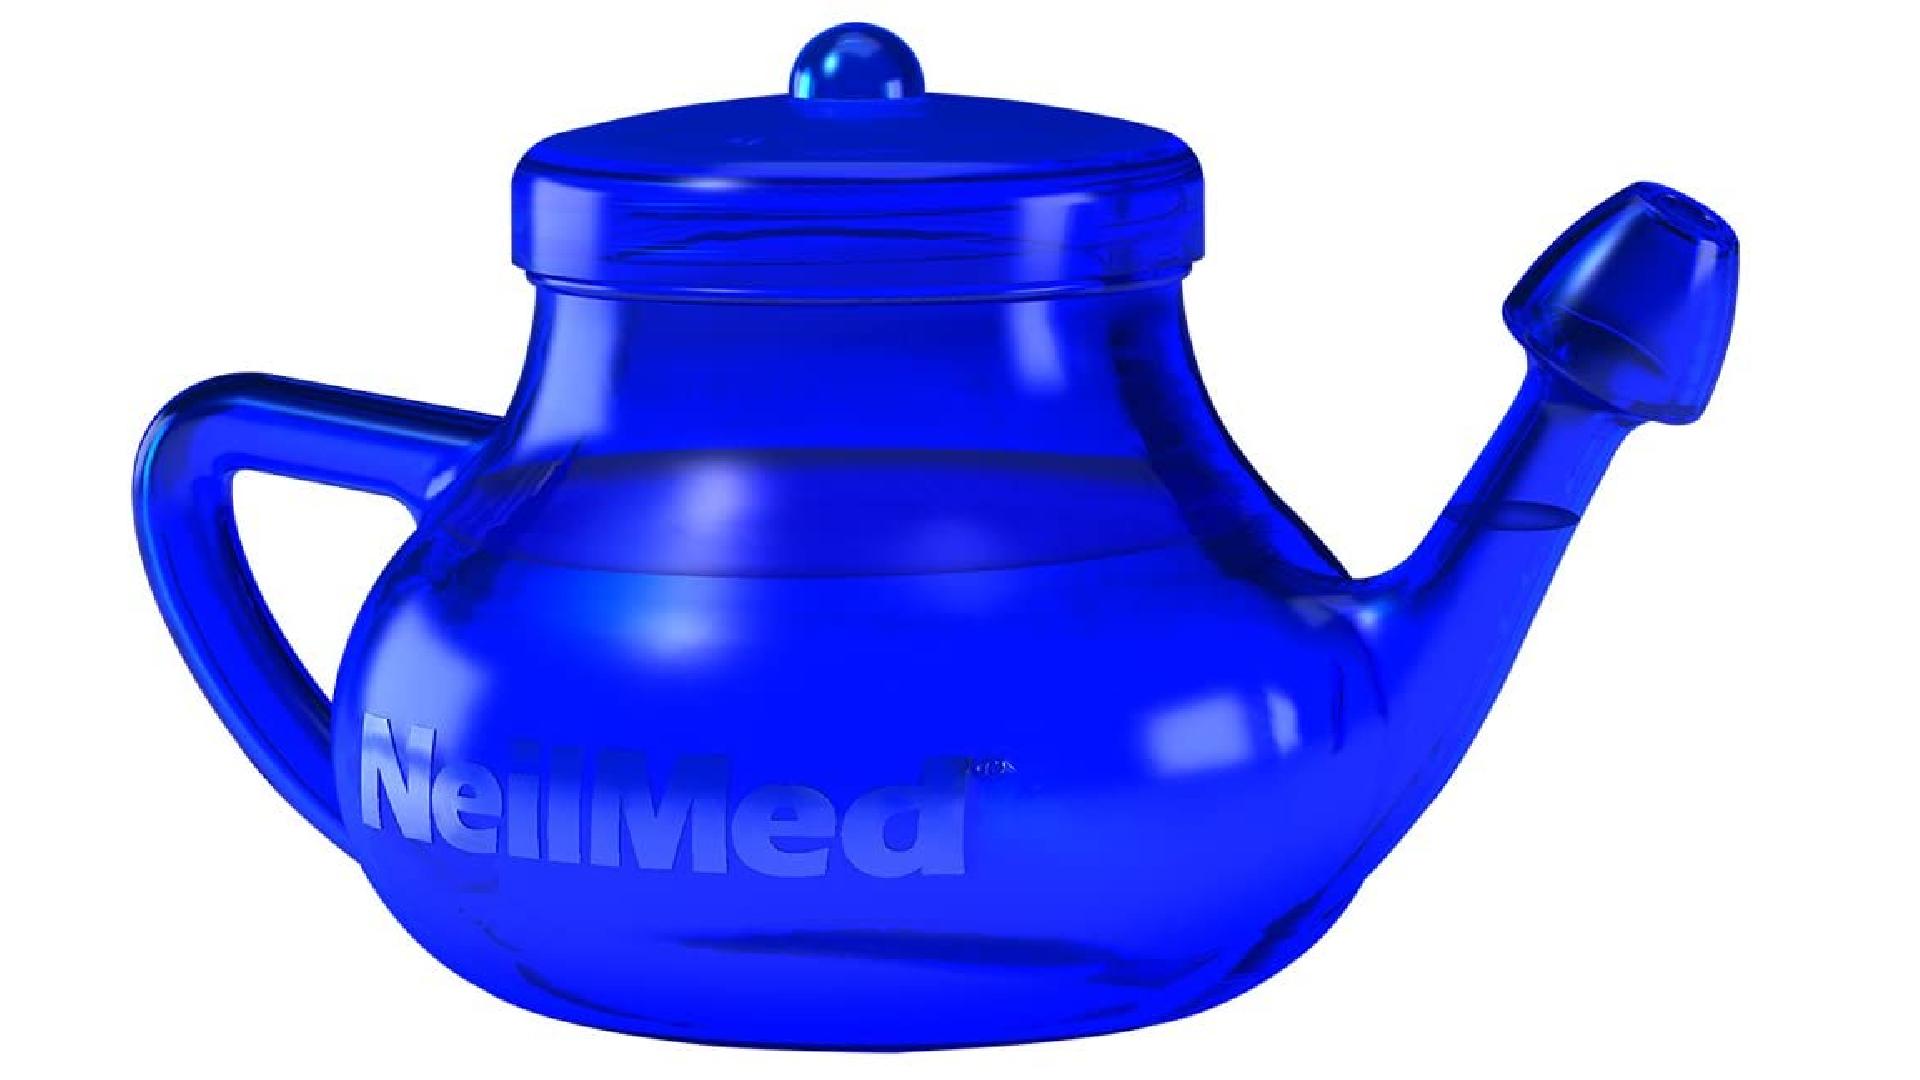 a blue netipot full of water